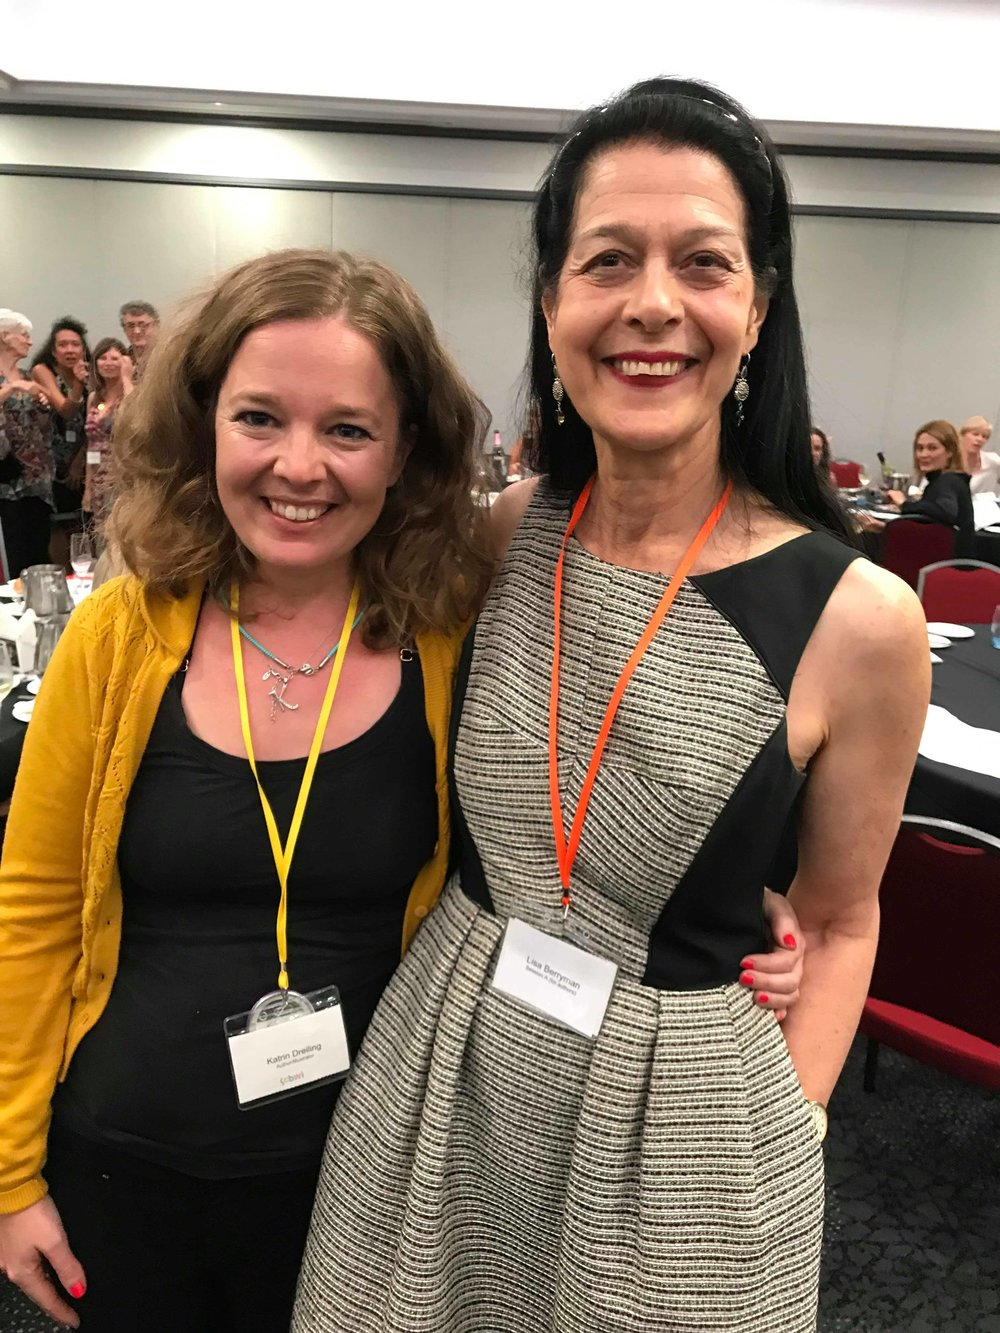 Katrin with HaperCollin's Lisa Berryman